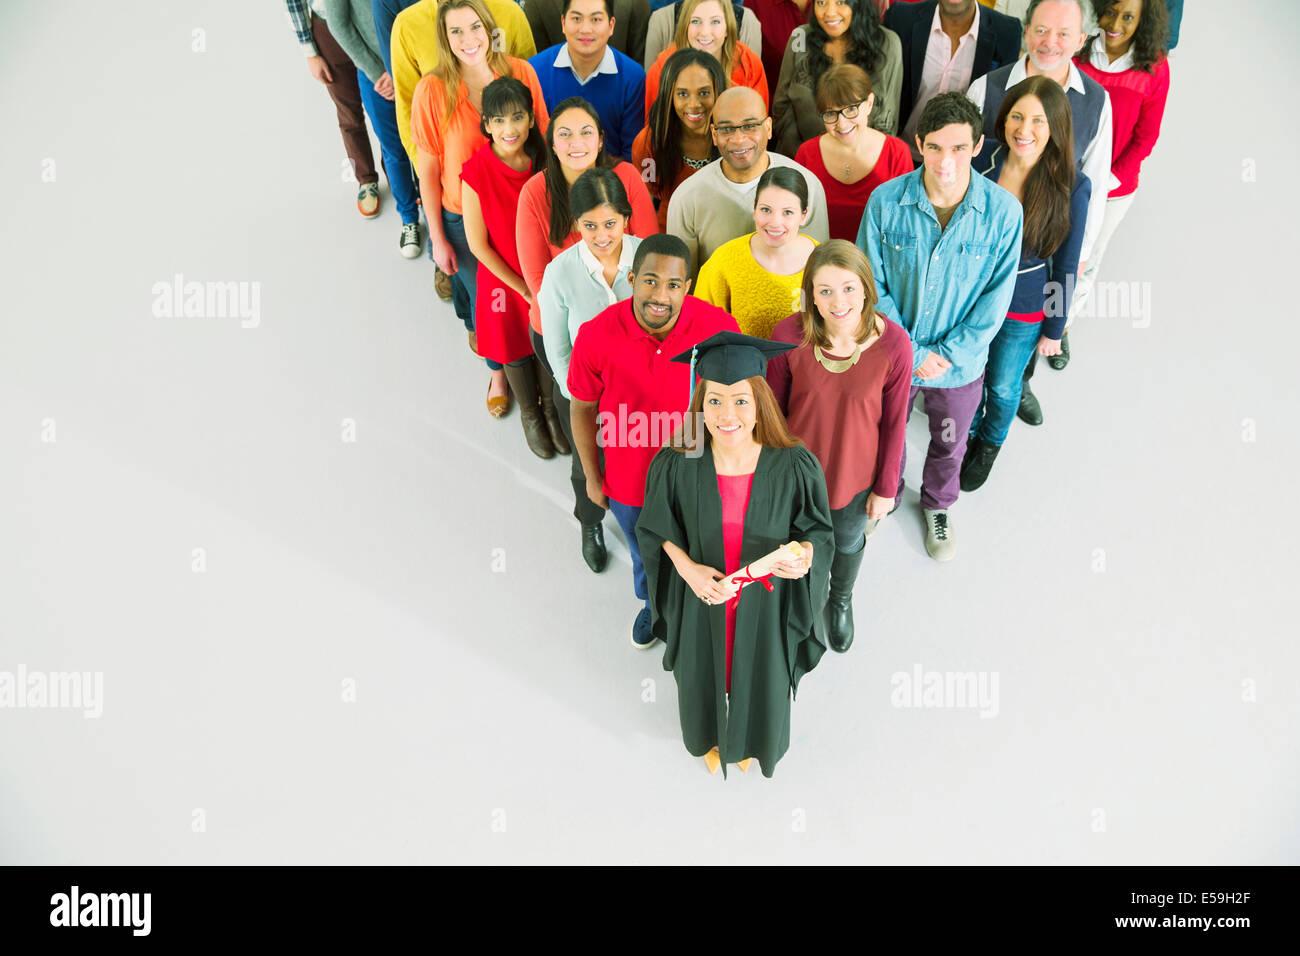 Diverse crowd behind confident graduate - Stock Image